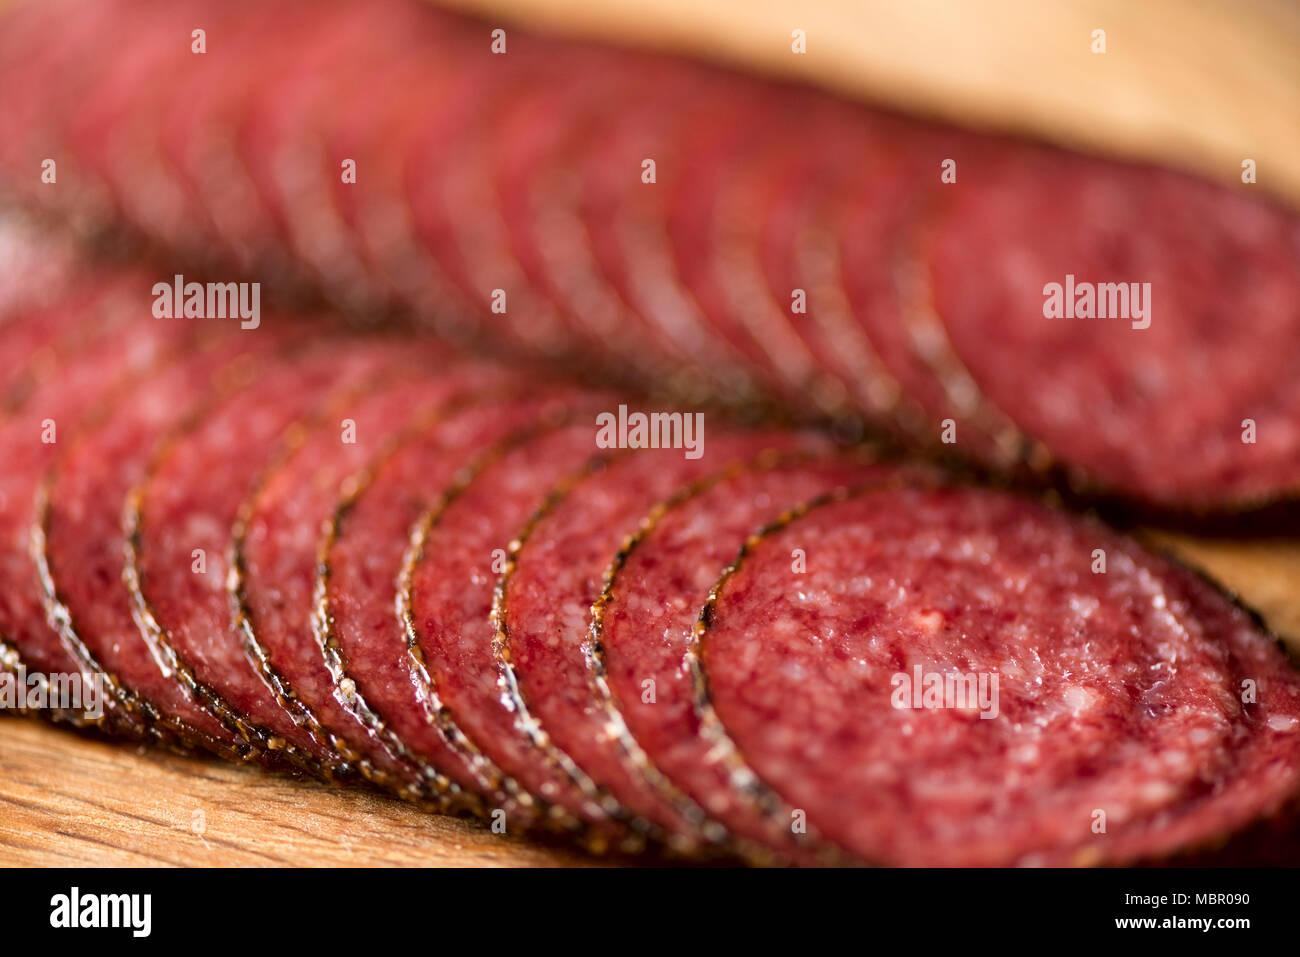 Macro of smoked salami sausage background. Top view, copy space. Sliced salami texture close up - Stock Image